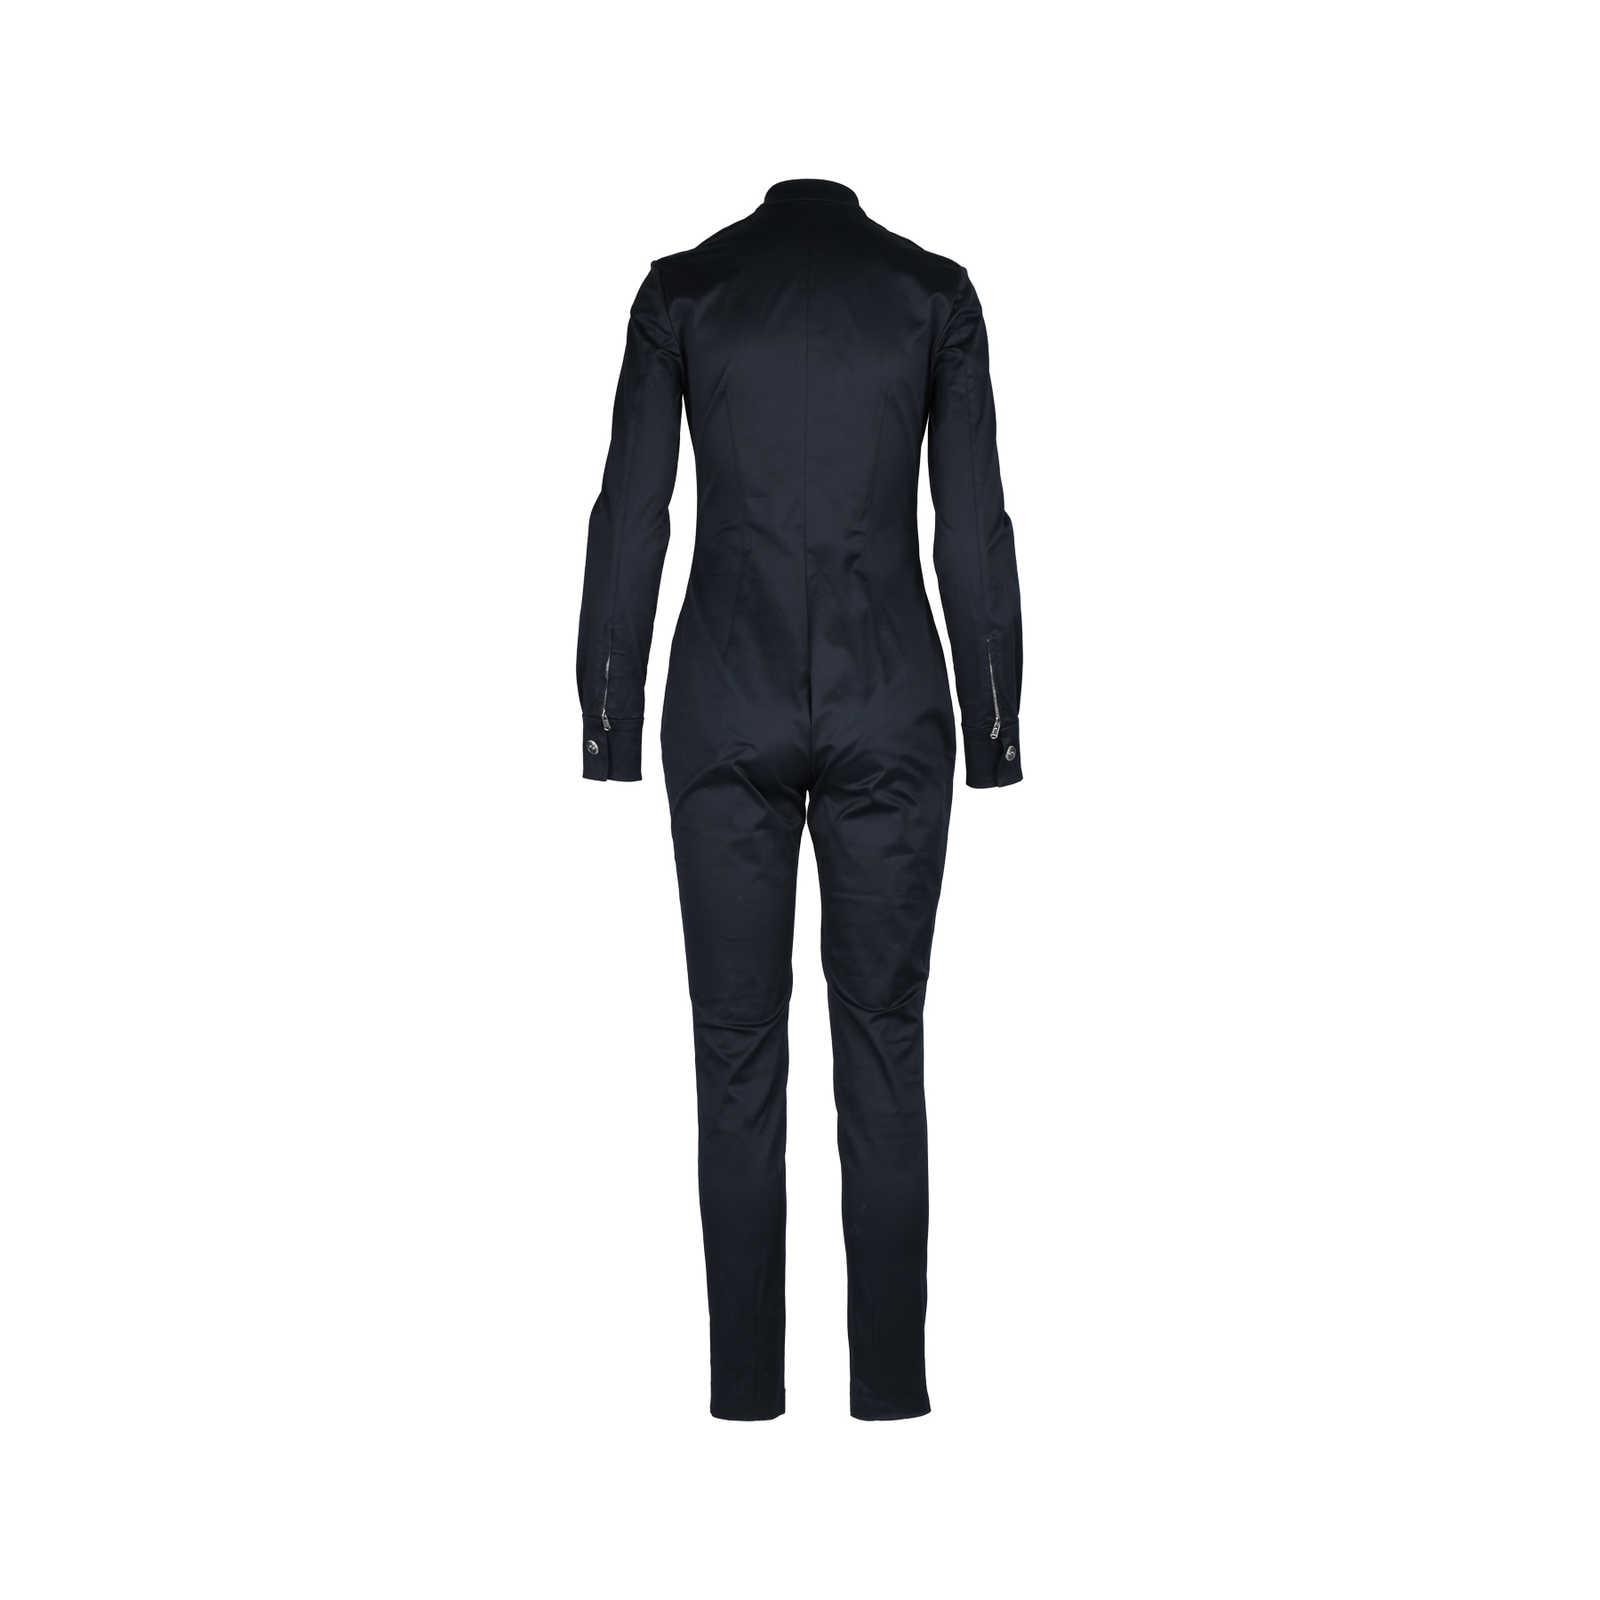 8eb9437176fea ... Authentic Second Hand Yves Saint Laurent Edition 24 Jumpsuit  (PSS-005-00033) ...